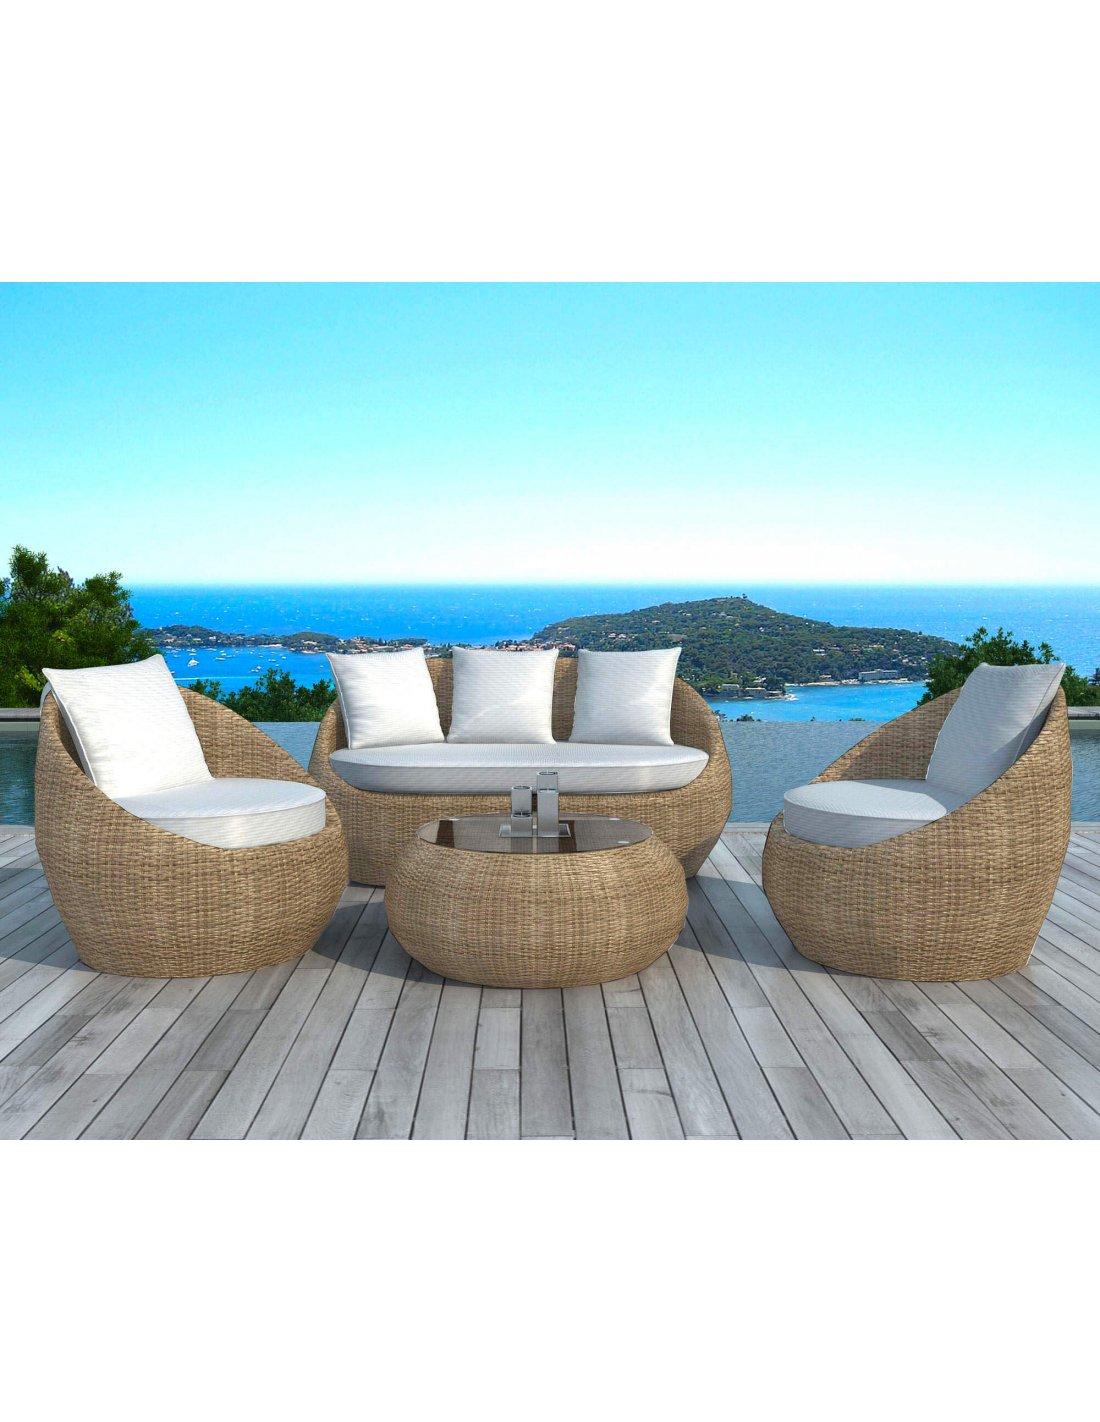 salon de jardin delorm rotin r sine tress e ronde delorm. Black Bedroom Furniture Sets. Home Design Ideas